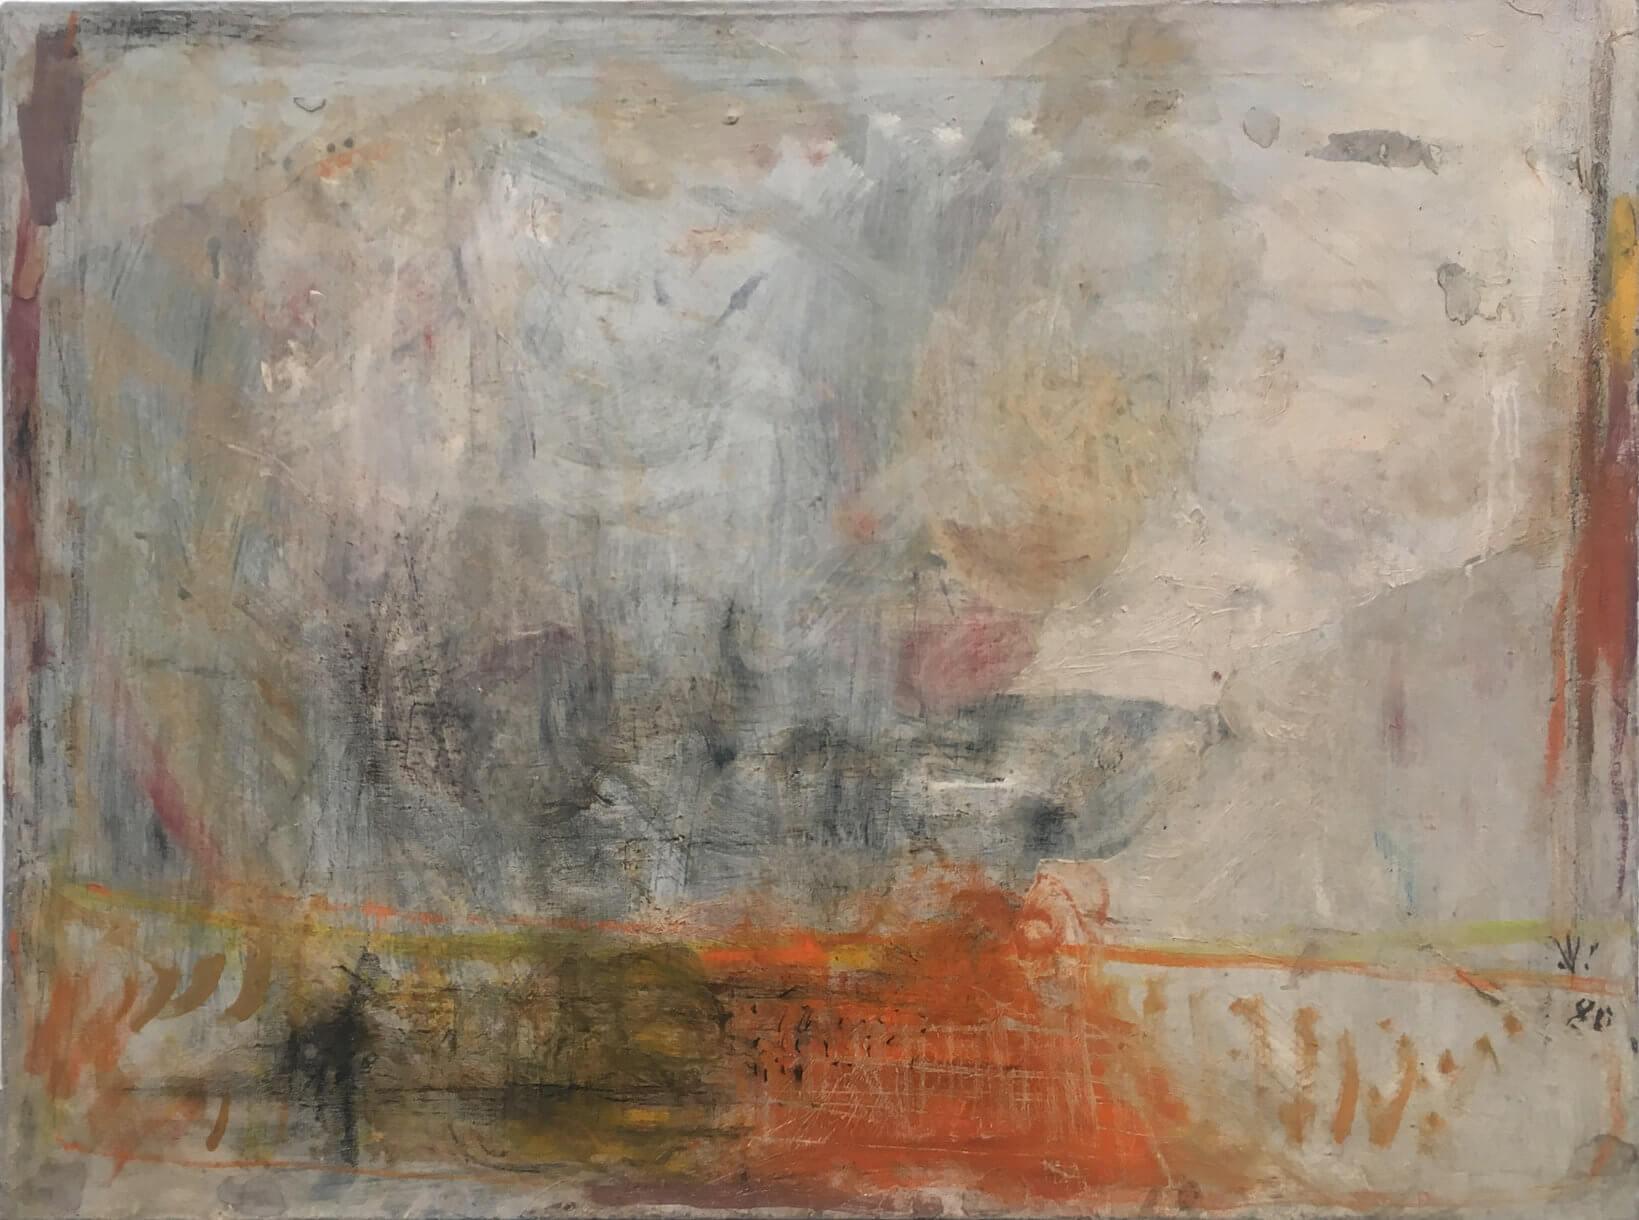 1478_Yehezkel Streichman, 1980, Oil on canvas, 60x80 cm 9,500$-1639x1220